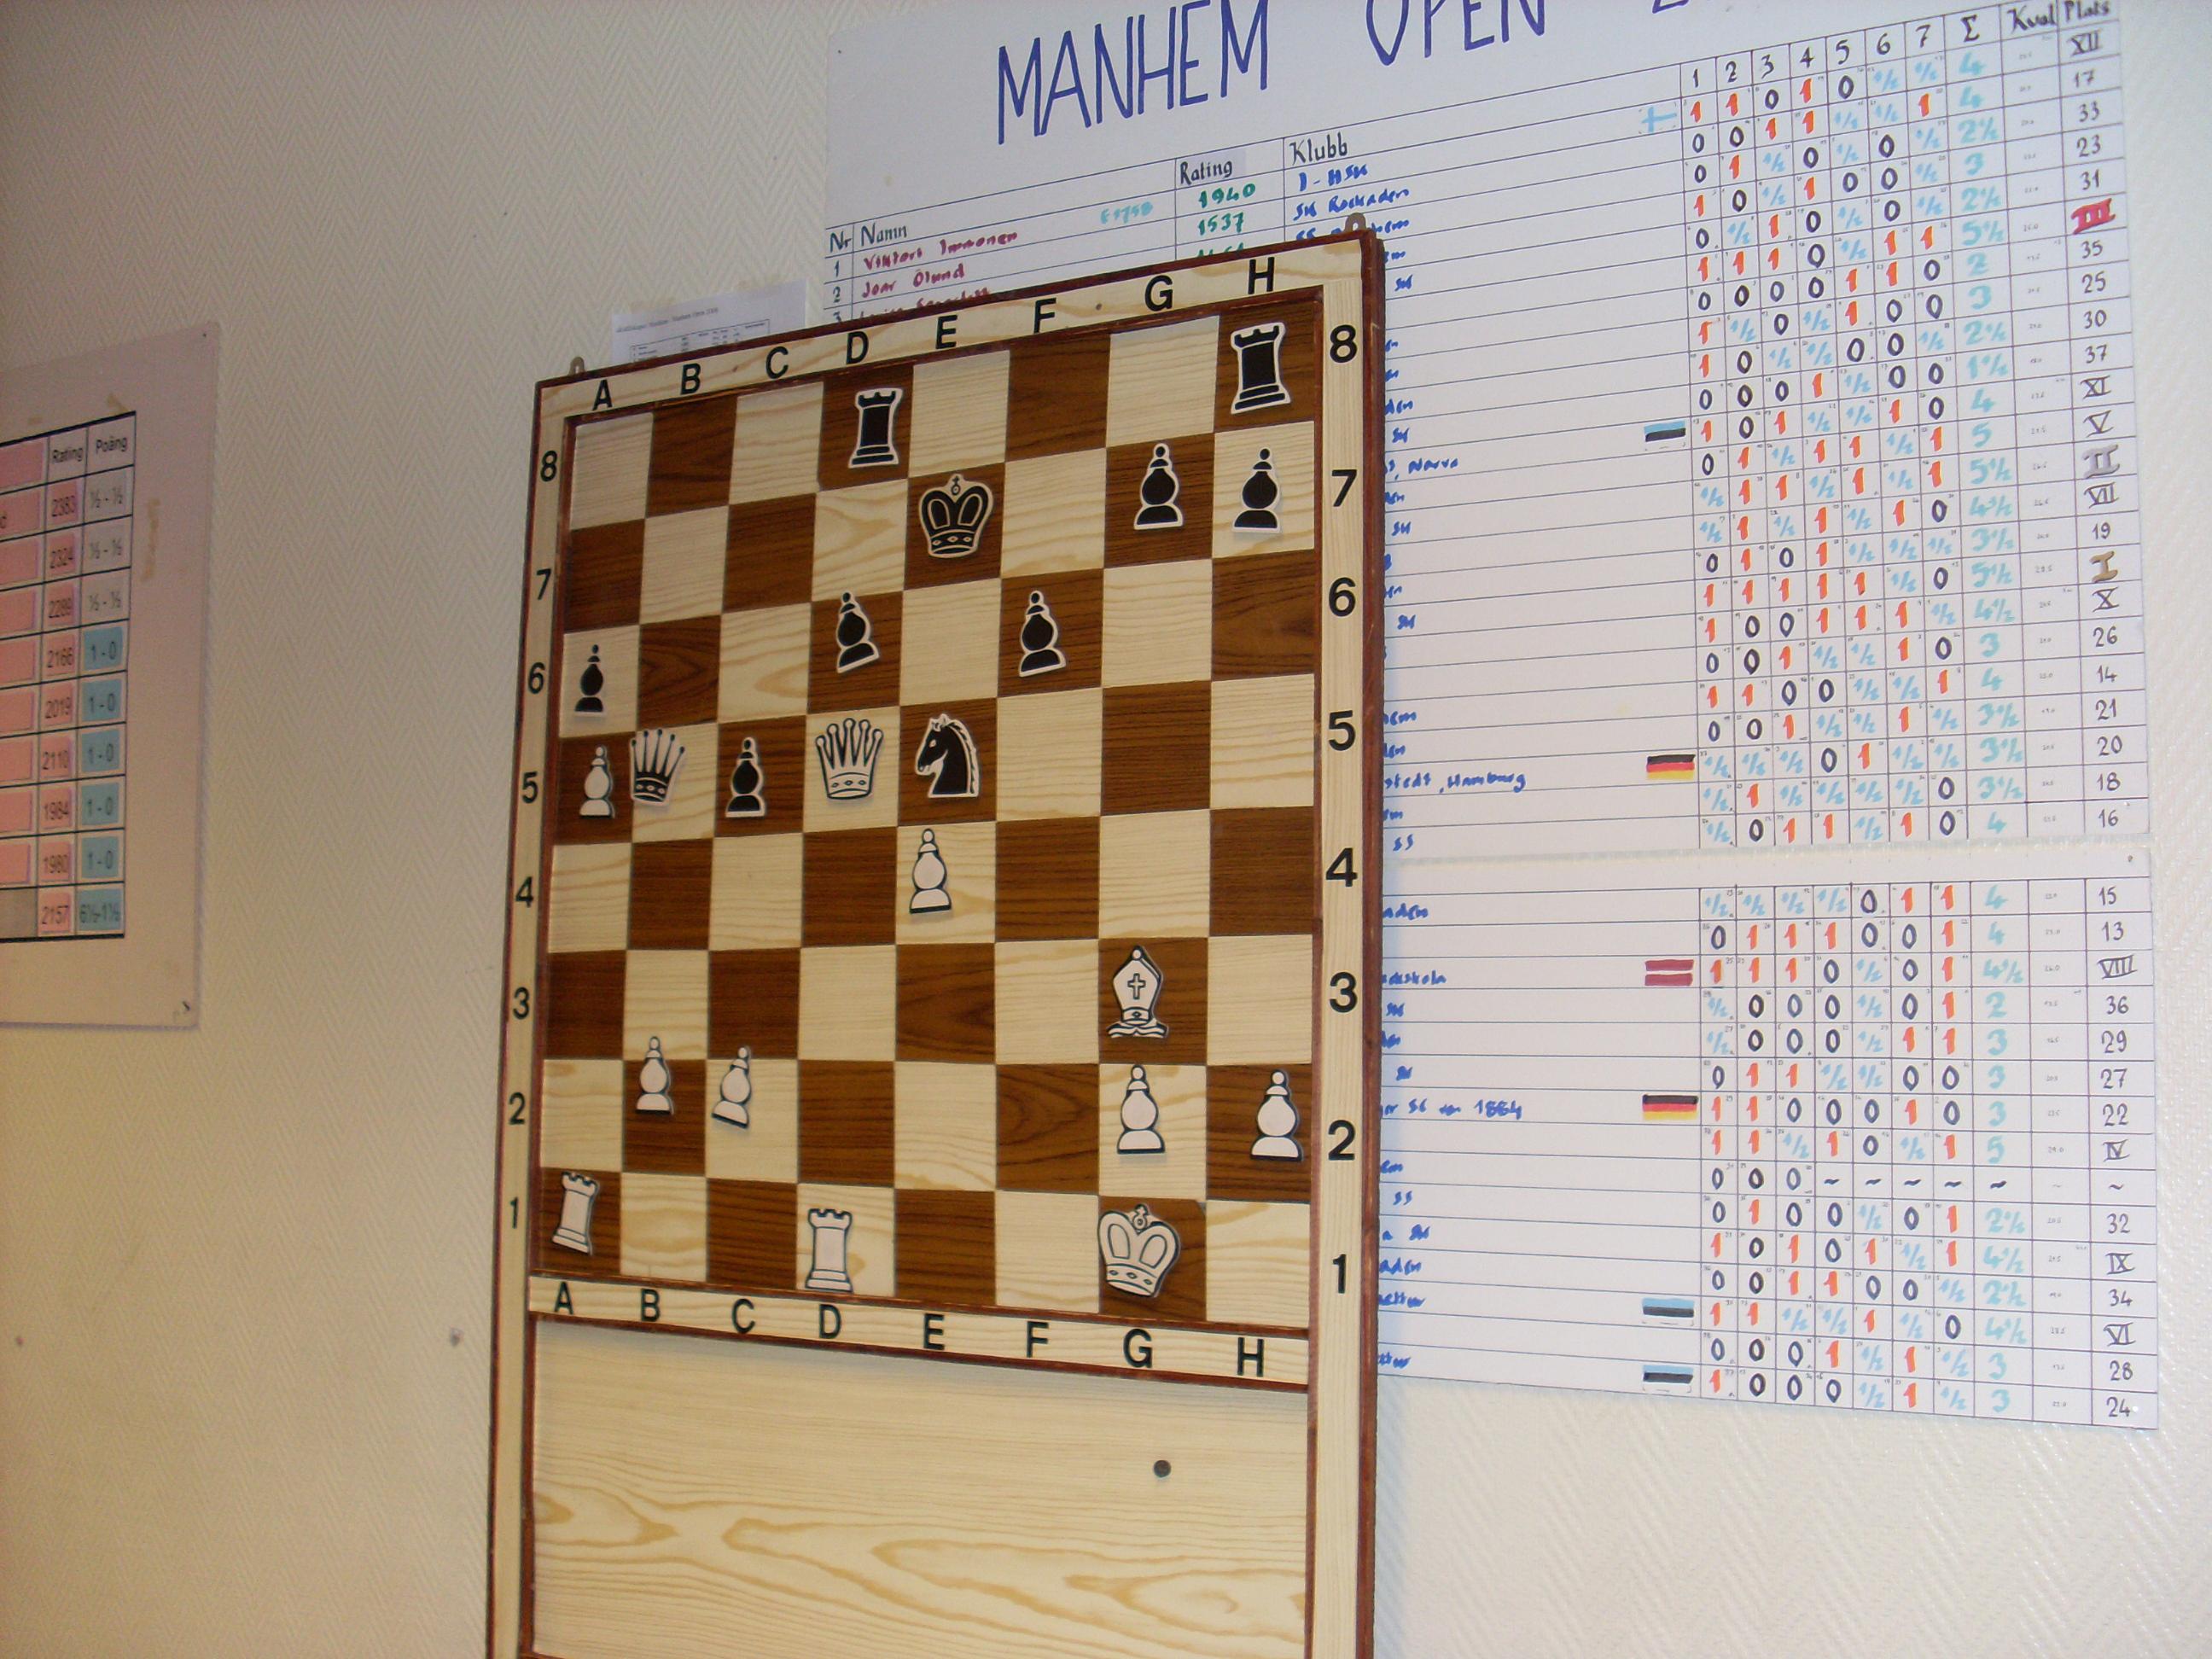 Schneider mot Romanisjin. Spelade Lars-Åke 1. b3, 1.c4 eller möjligen 1. Ta3?